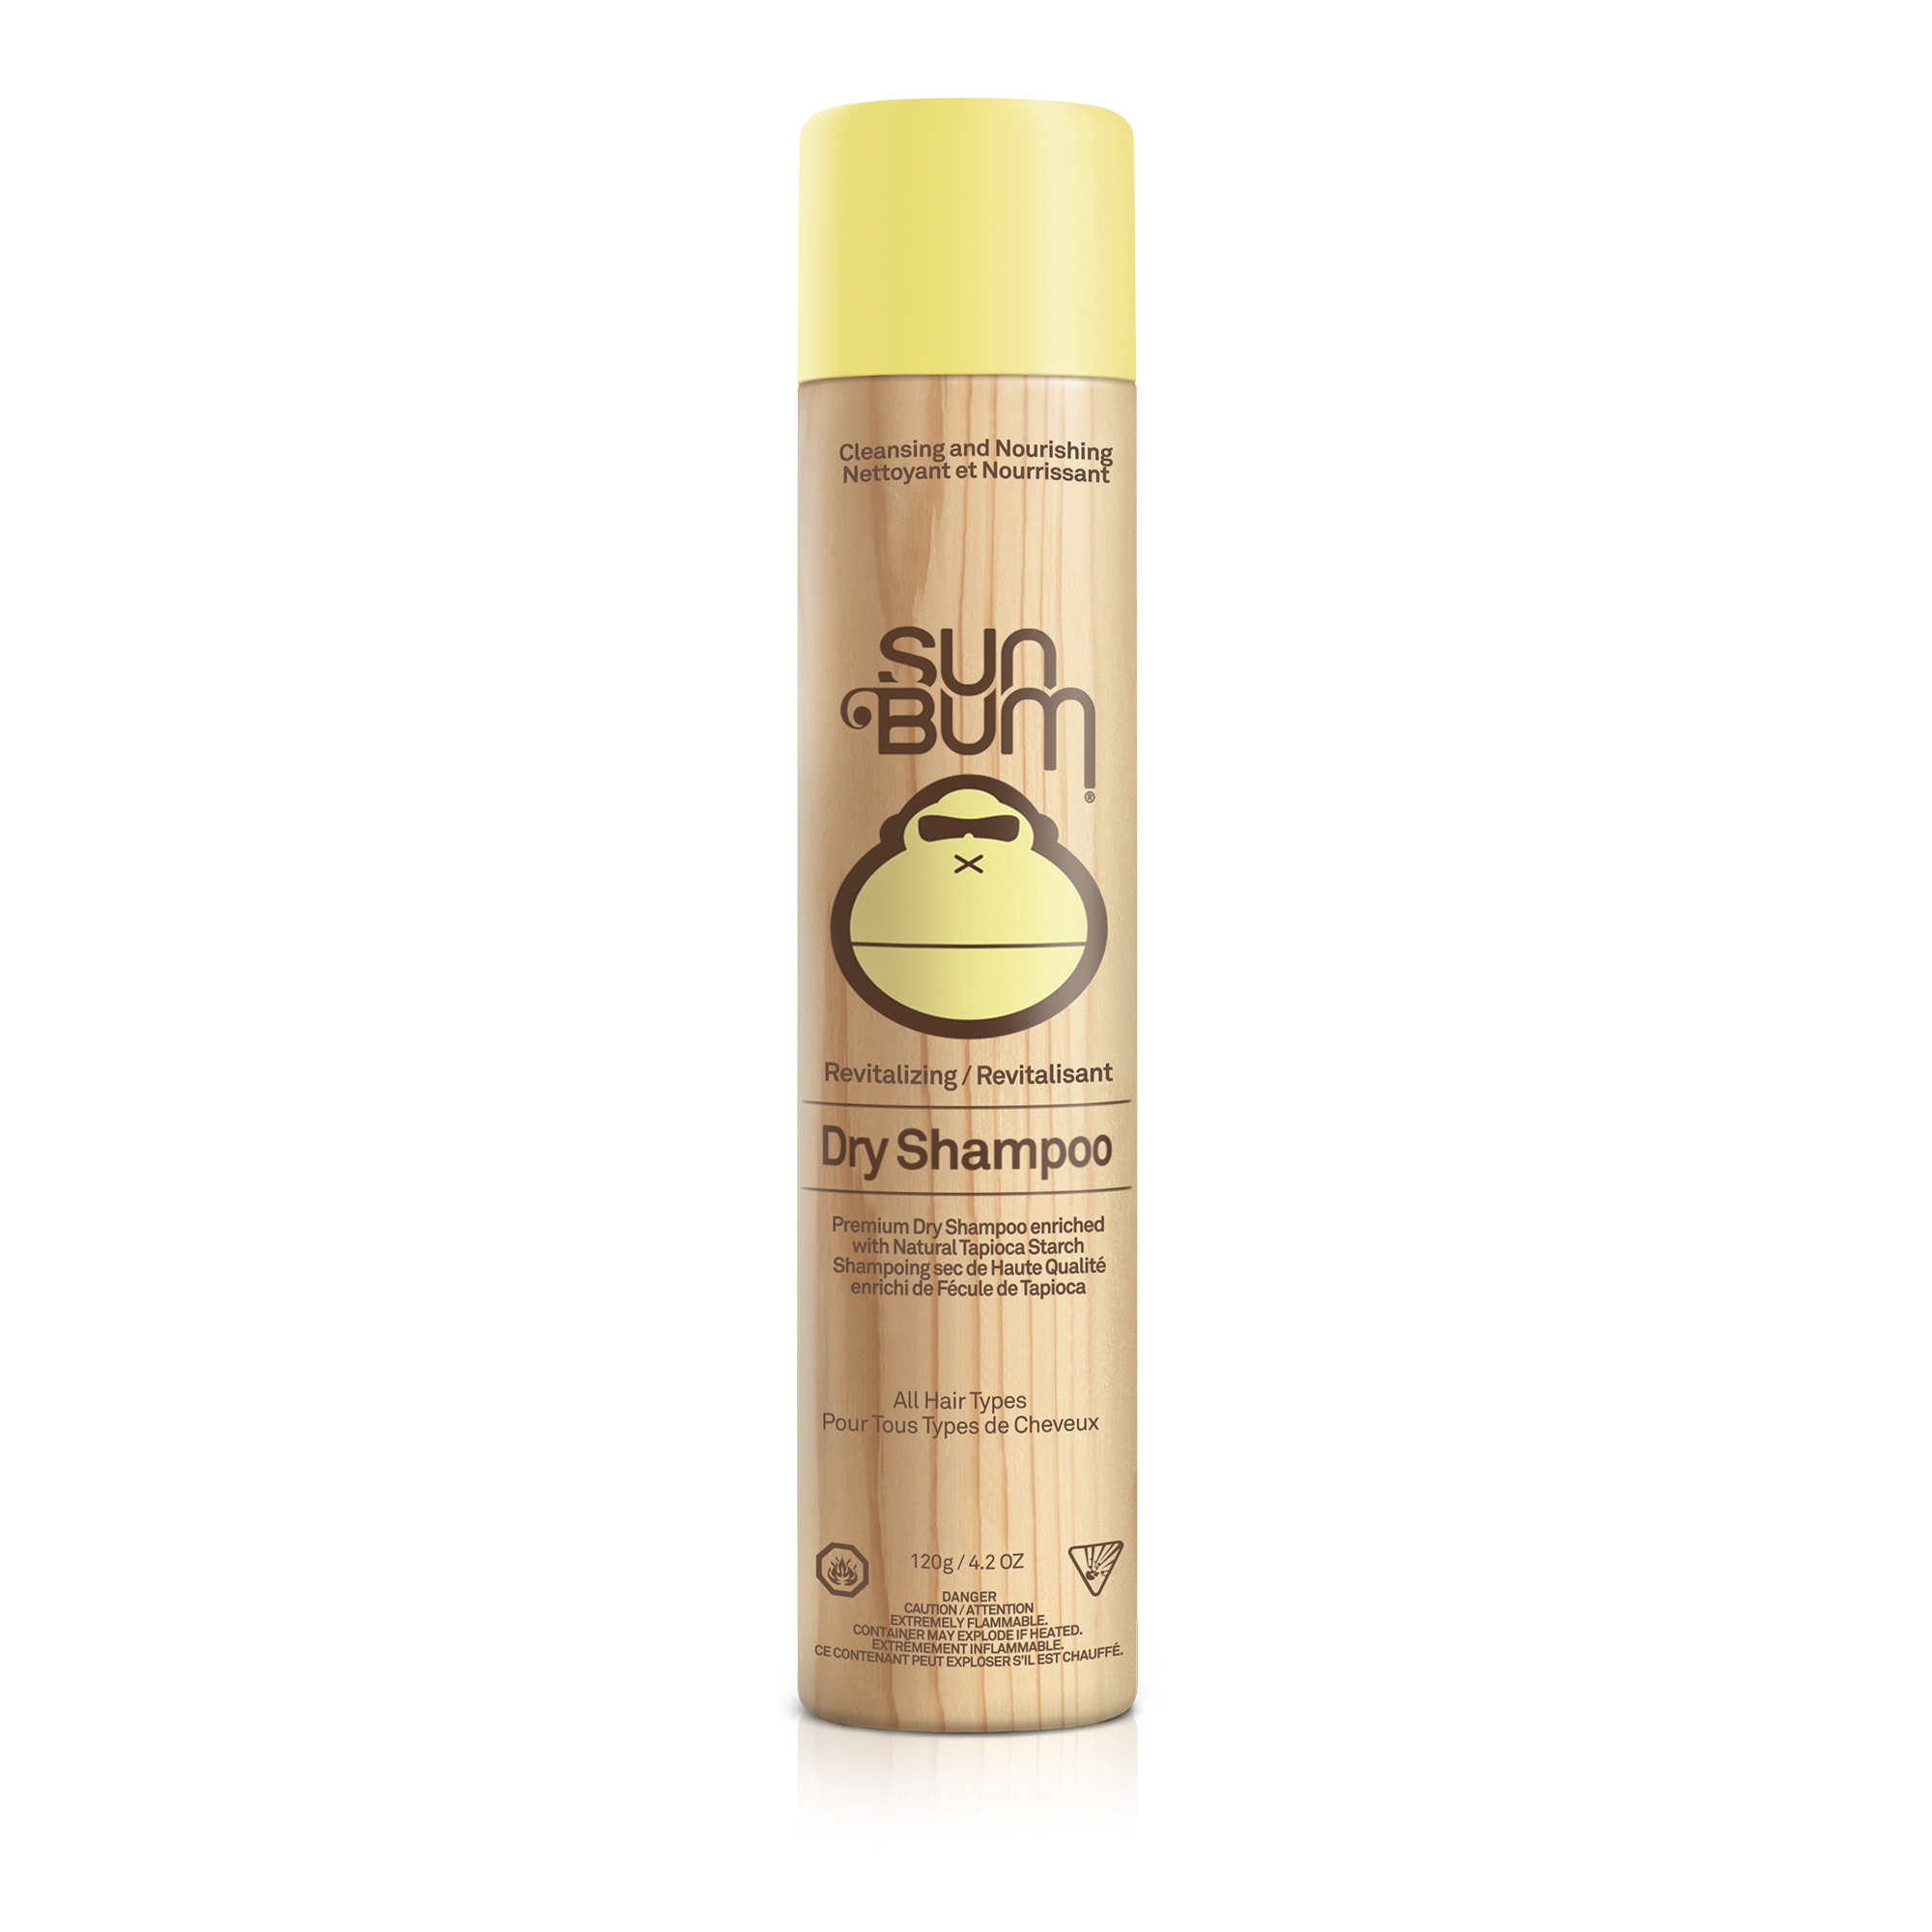 Sun Bum SunBum - Dry Shampoo